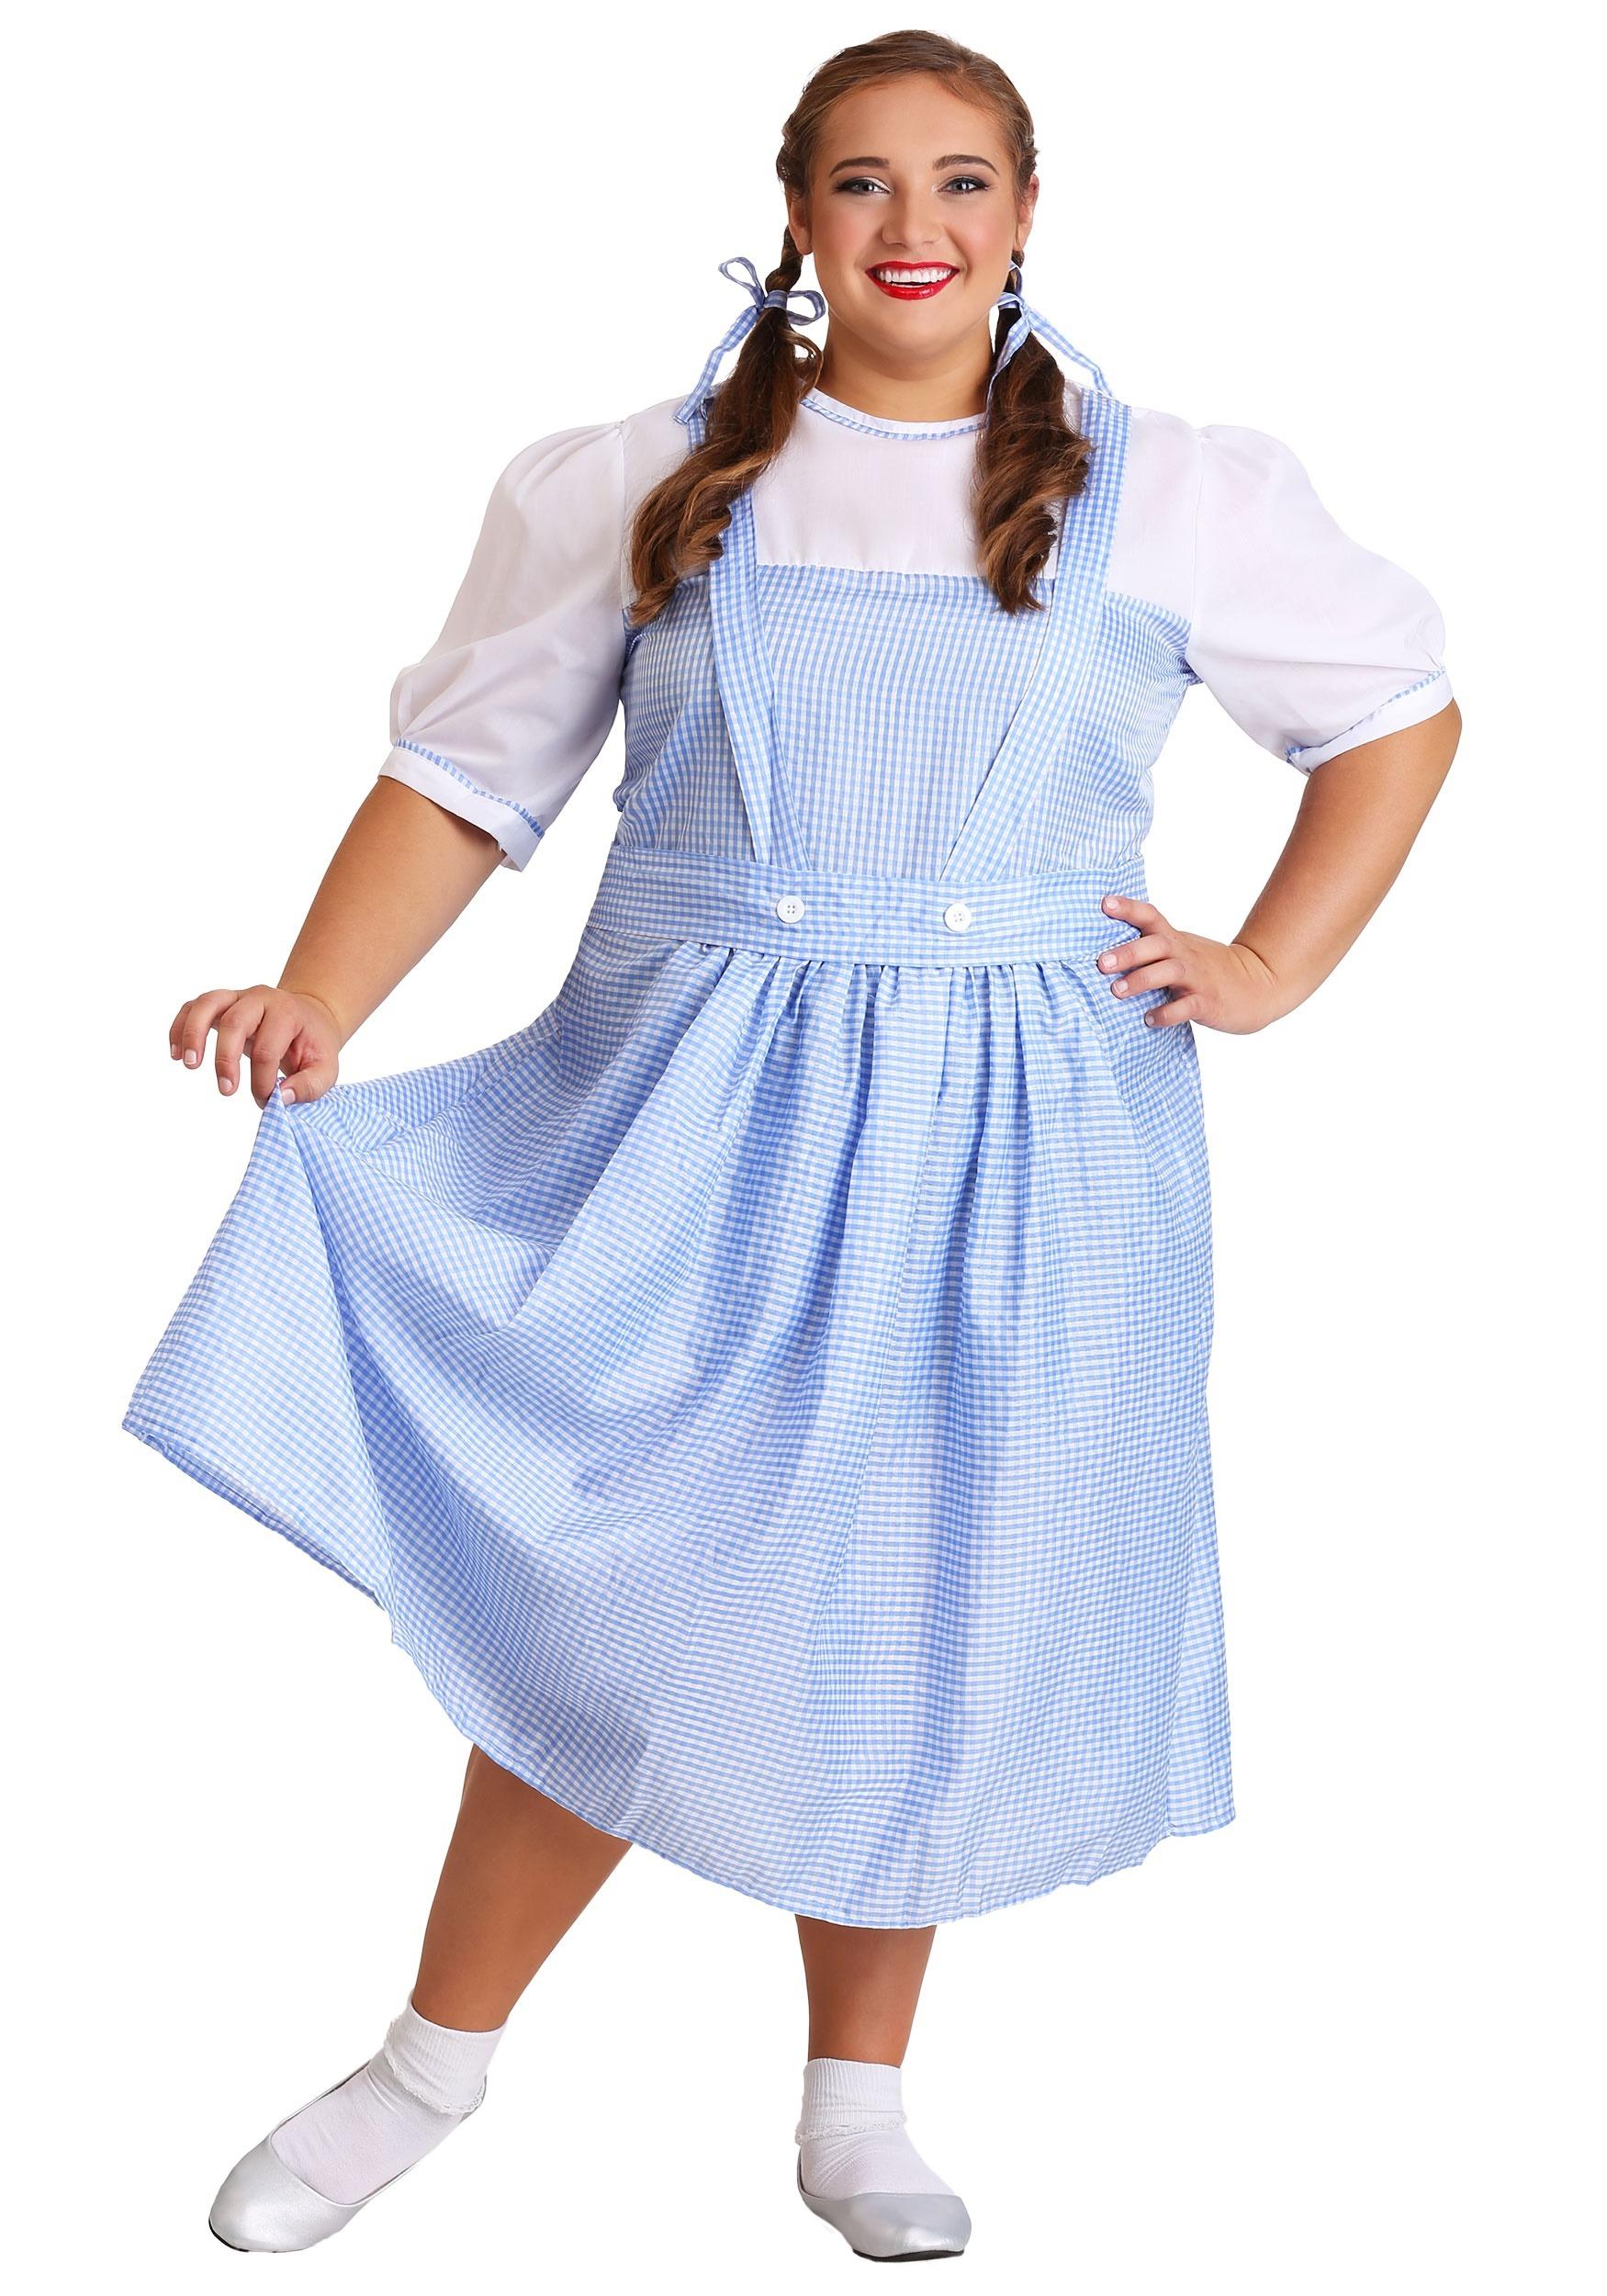 Plus Size Kansas Girl Costume